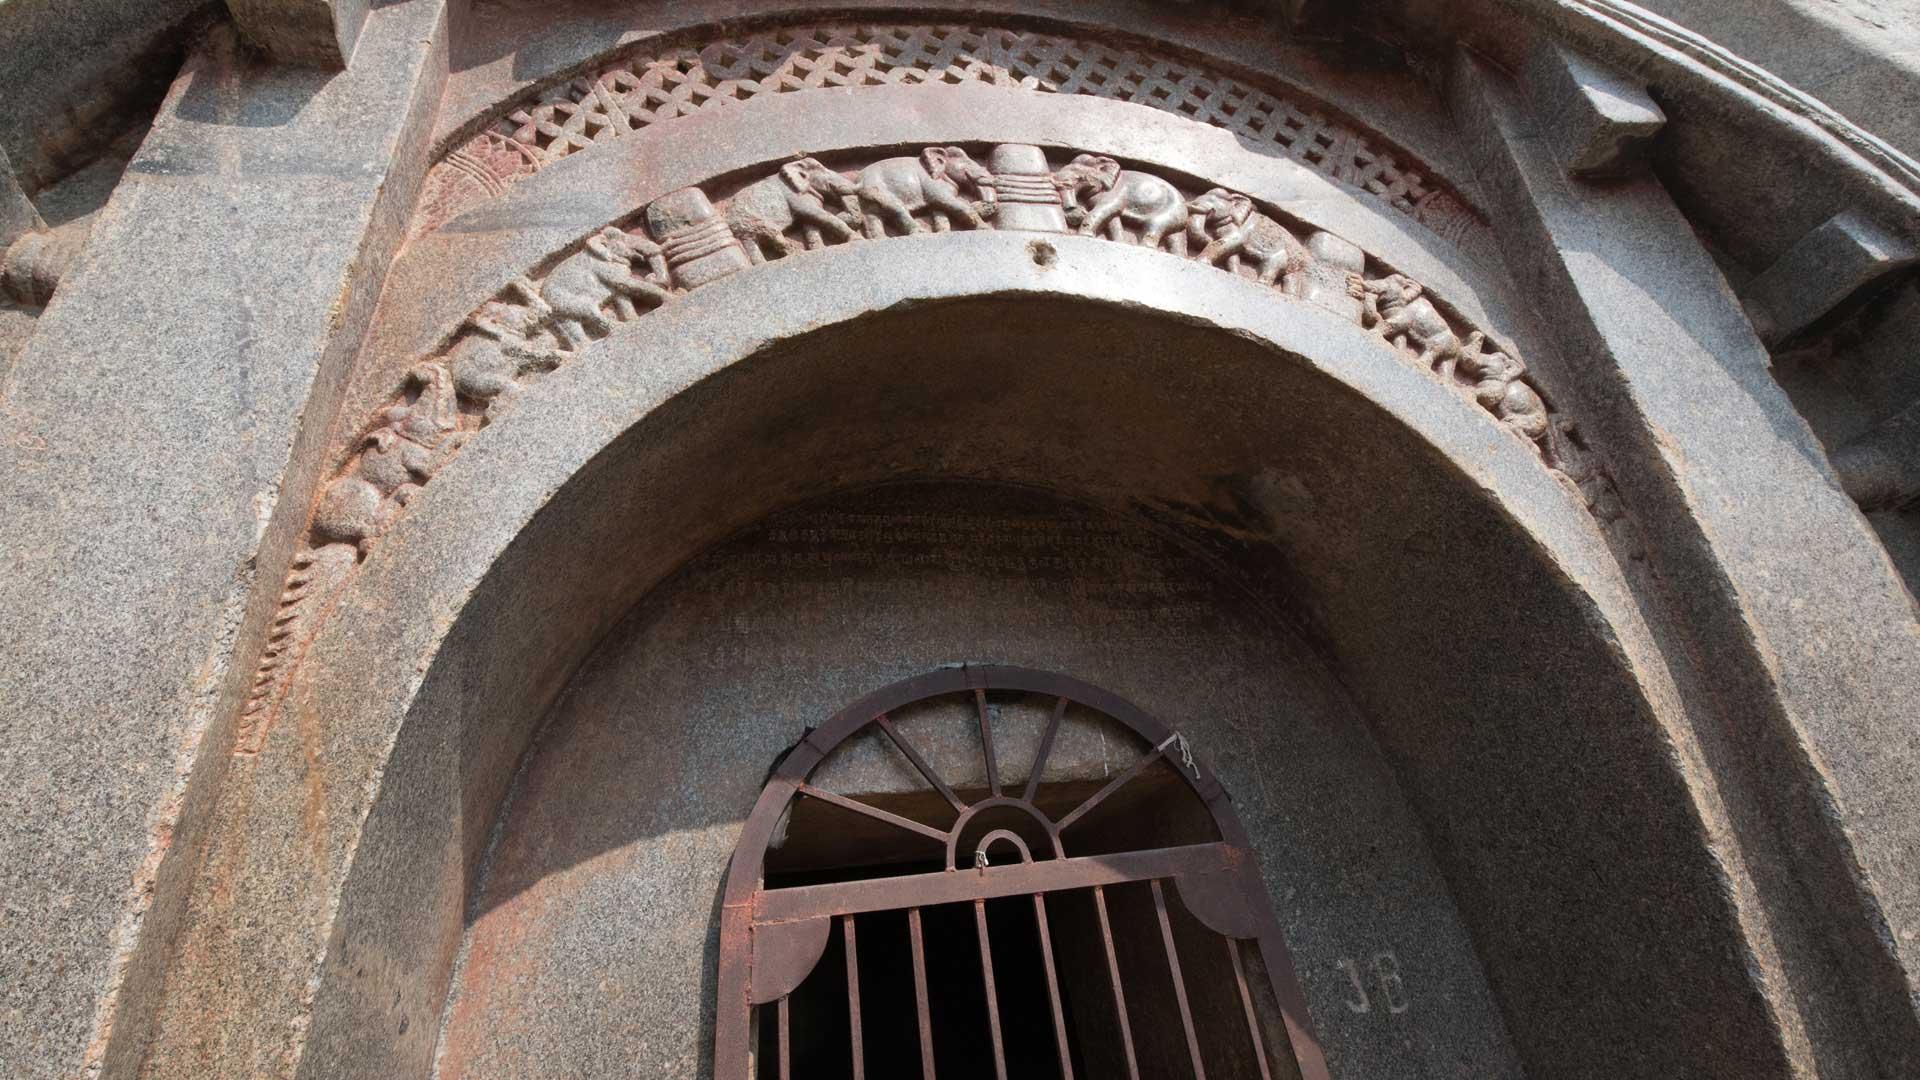 Barabar-BAM-film-granit-miroir-pyramide-inde-yoga-archeologie-17